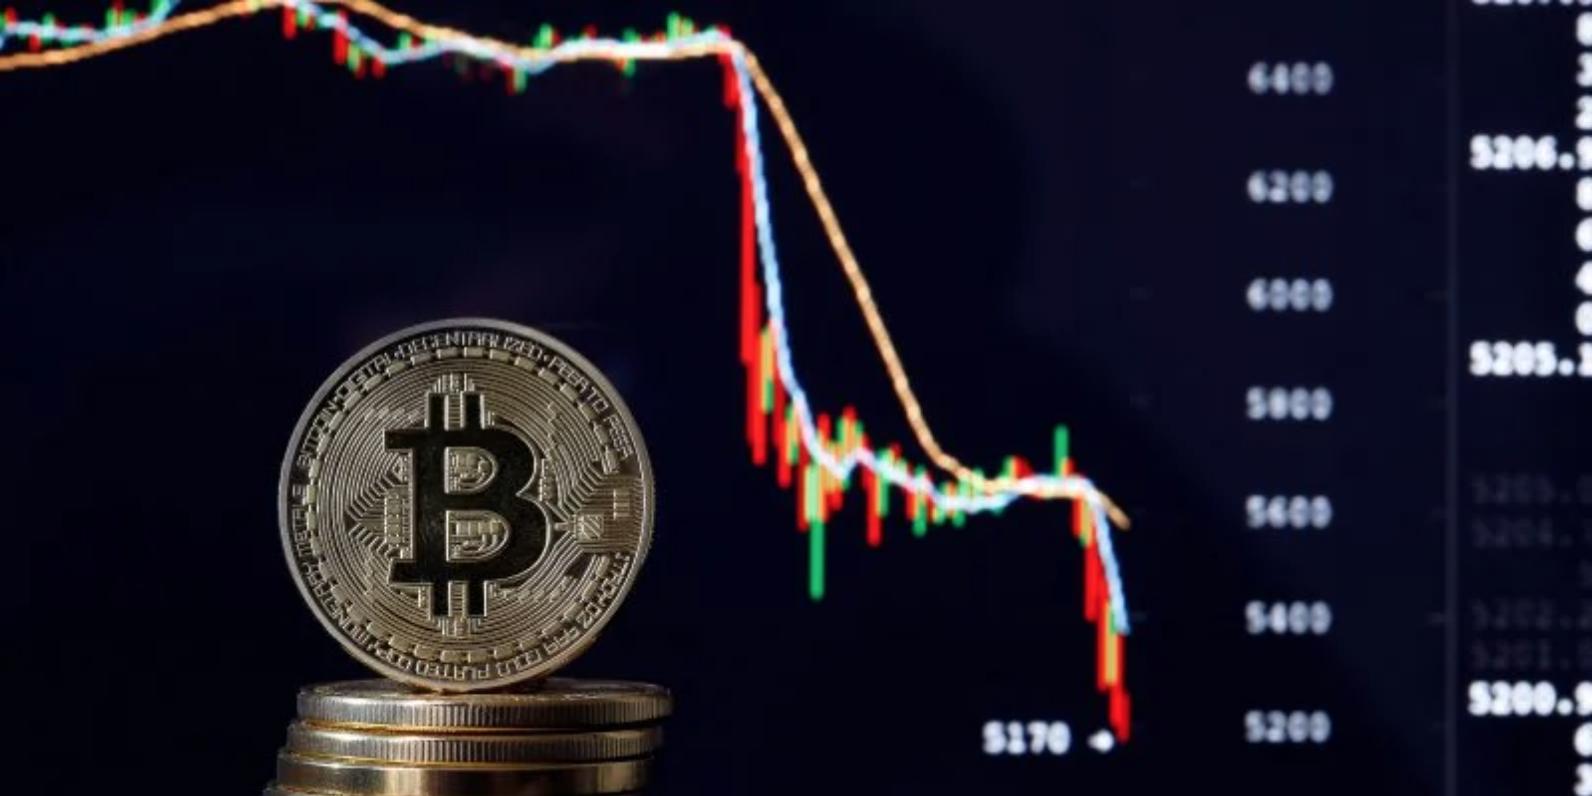 Bitcoin koersdaling